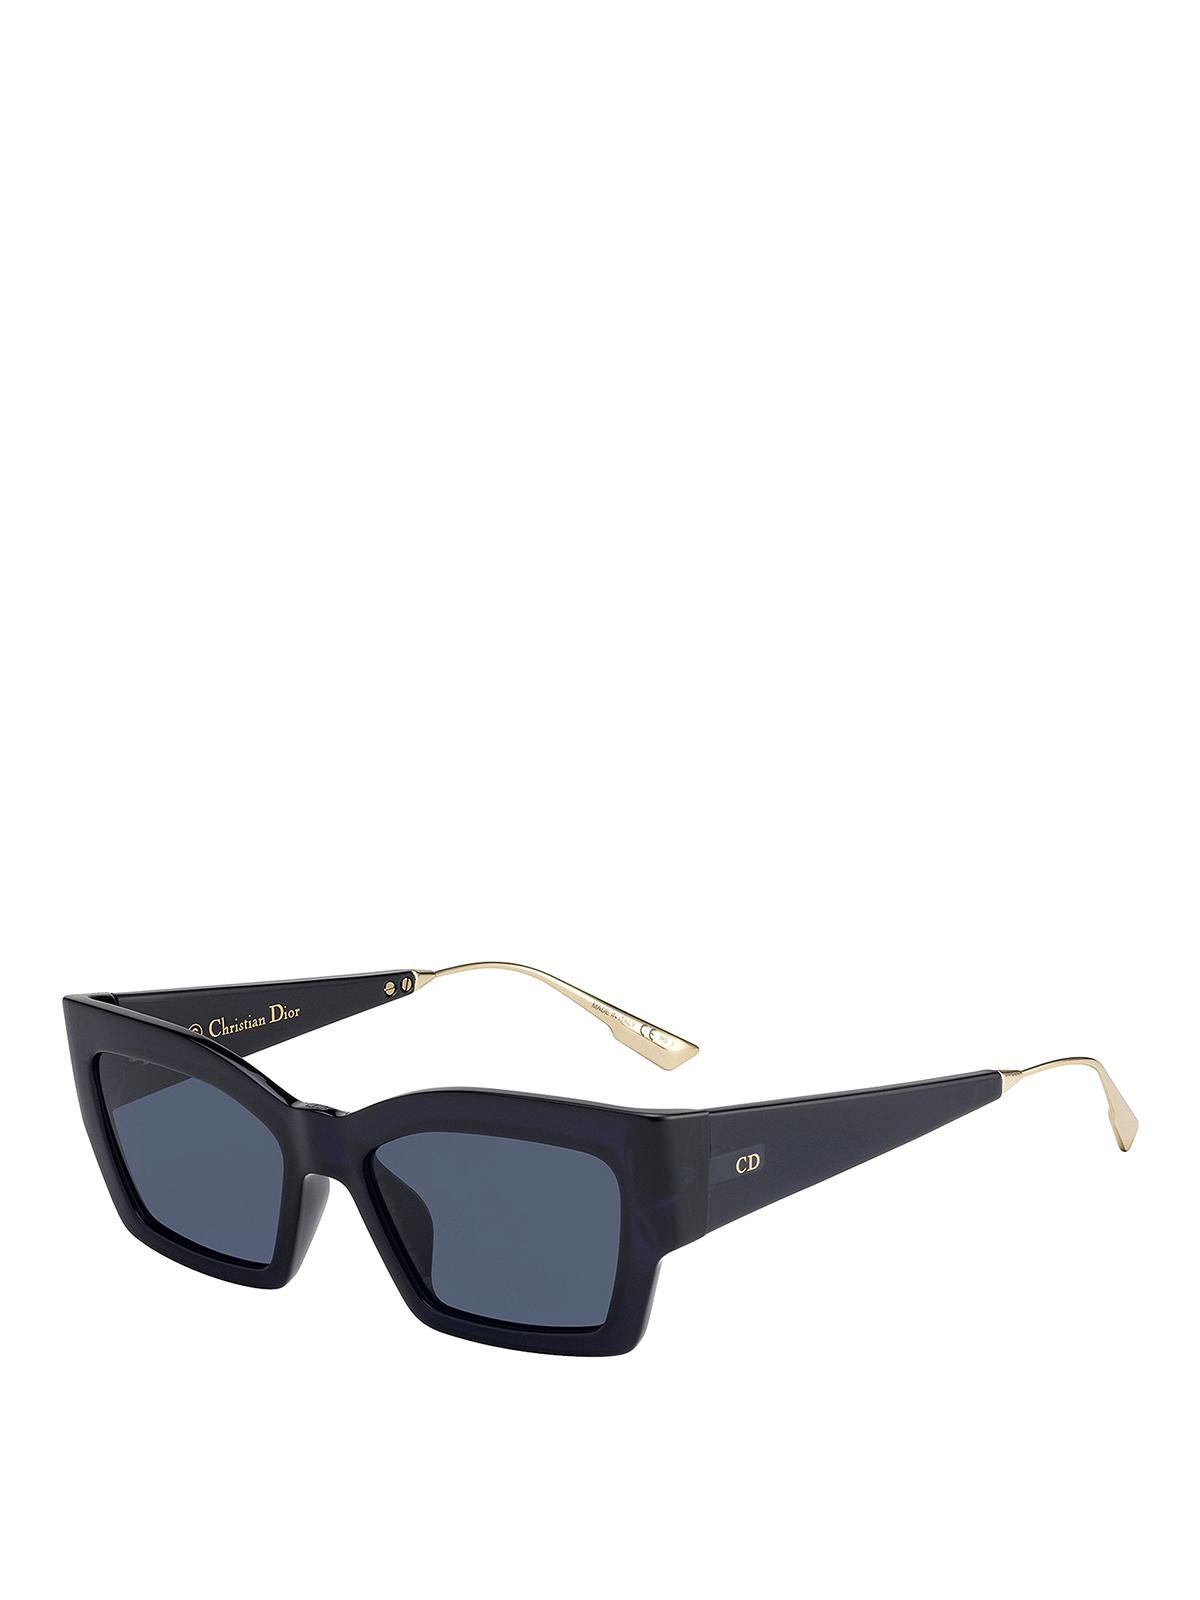 Dior Catstyle2 Blue Sunglasses